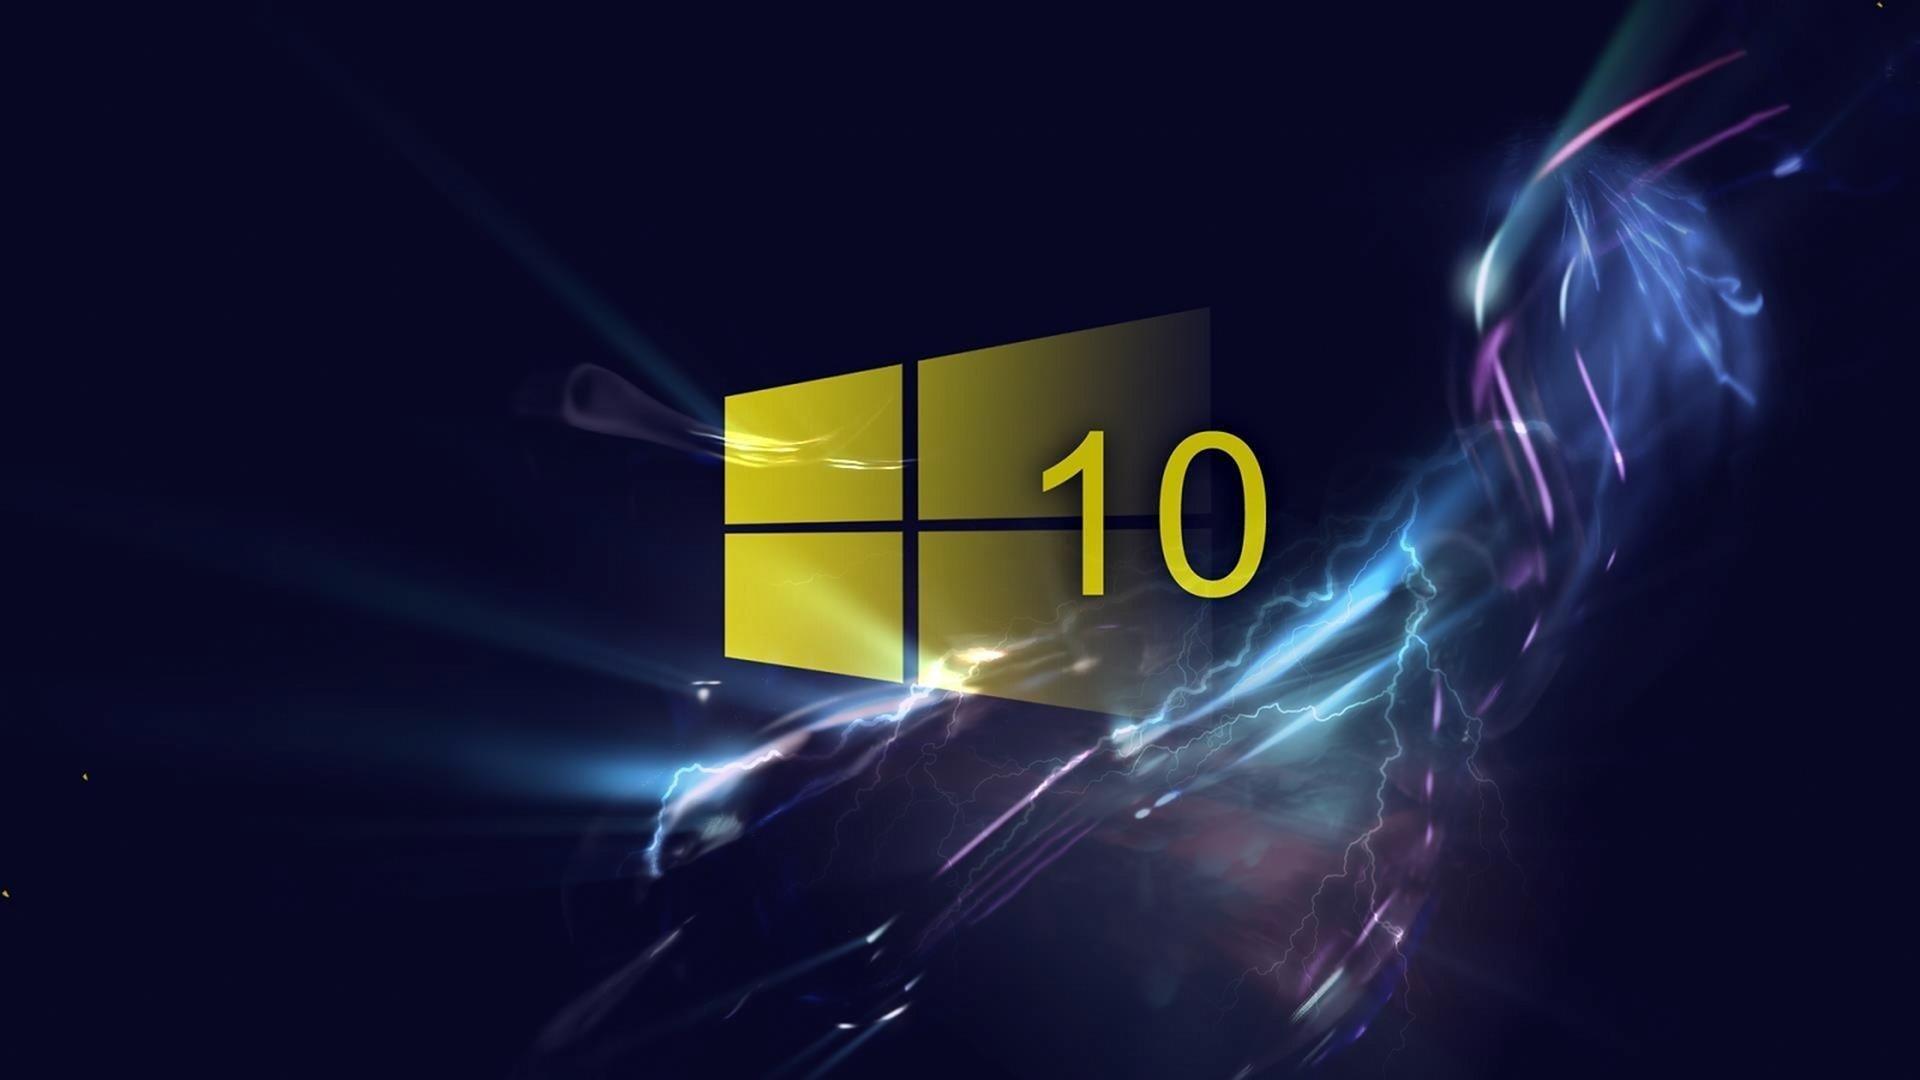 Free Hd Wallpaper For Windows 10 Full Hd Hd